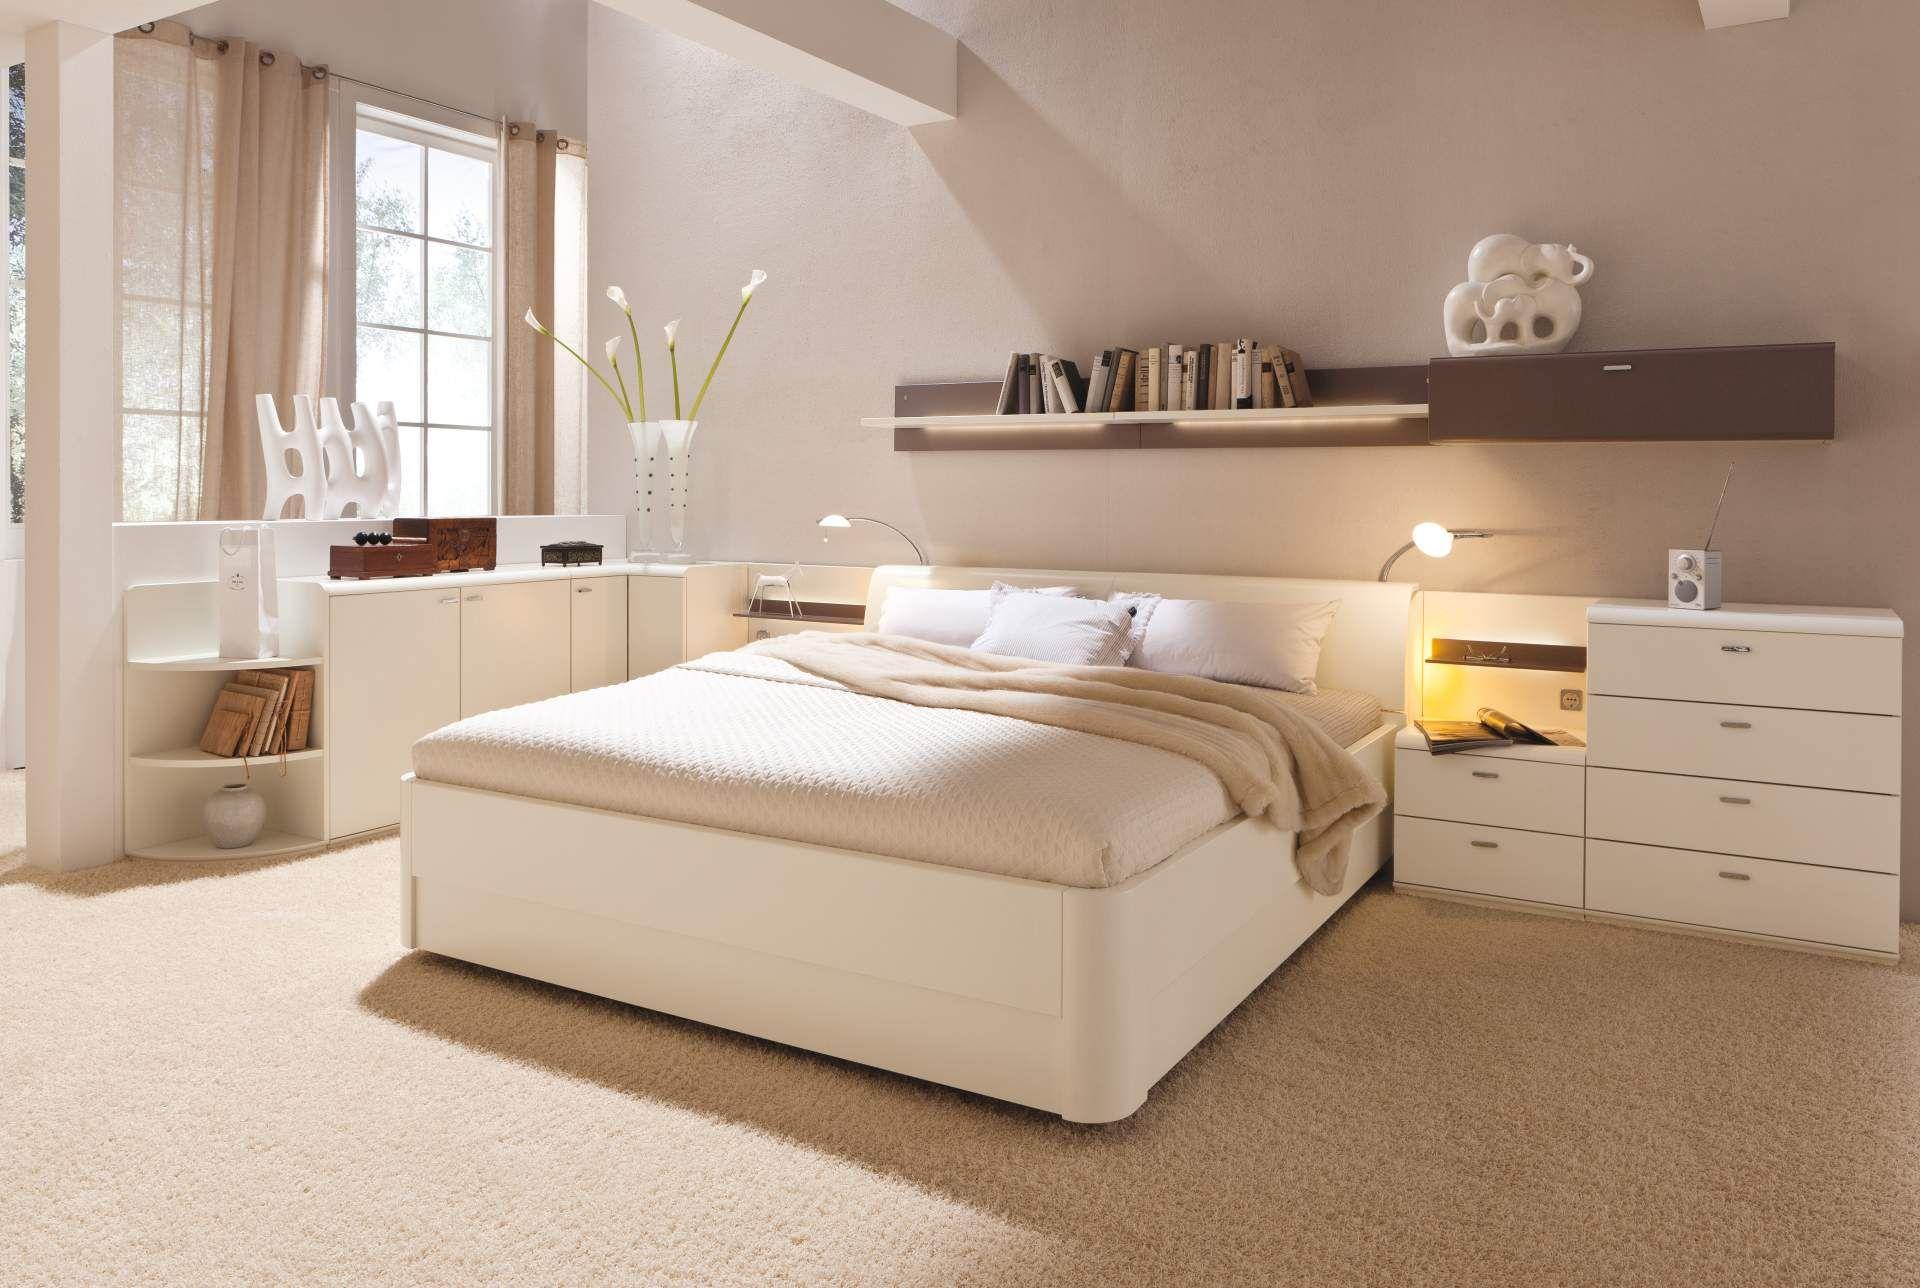 Betten Bad Kreuznach Von Huelsta Schlafzimmer Bett Bett Modern